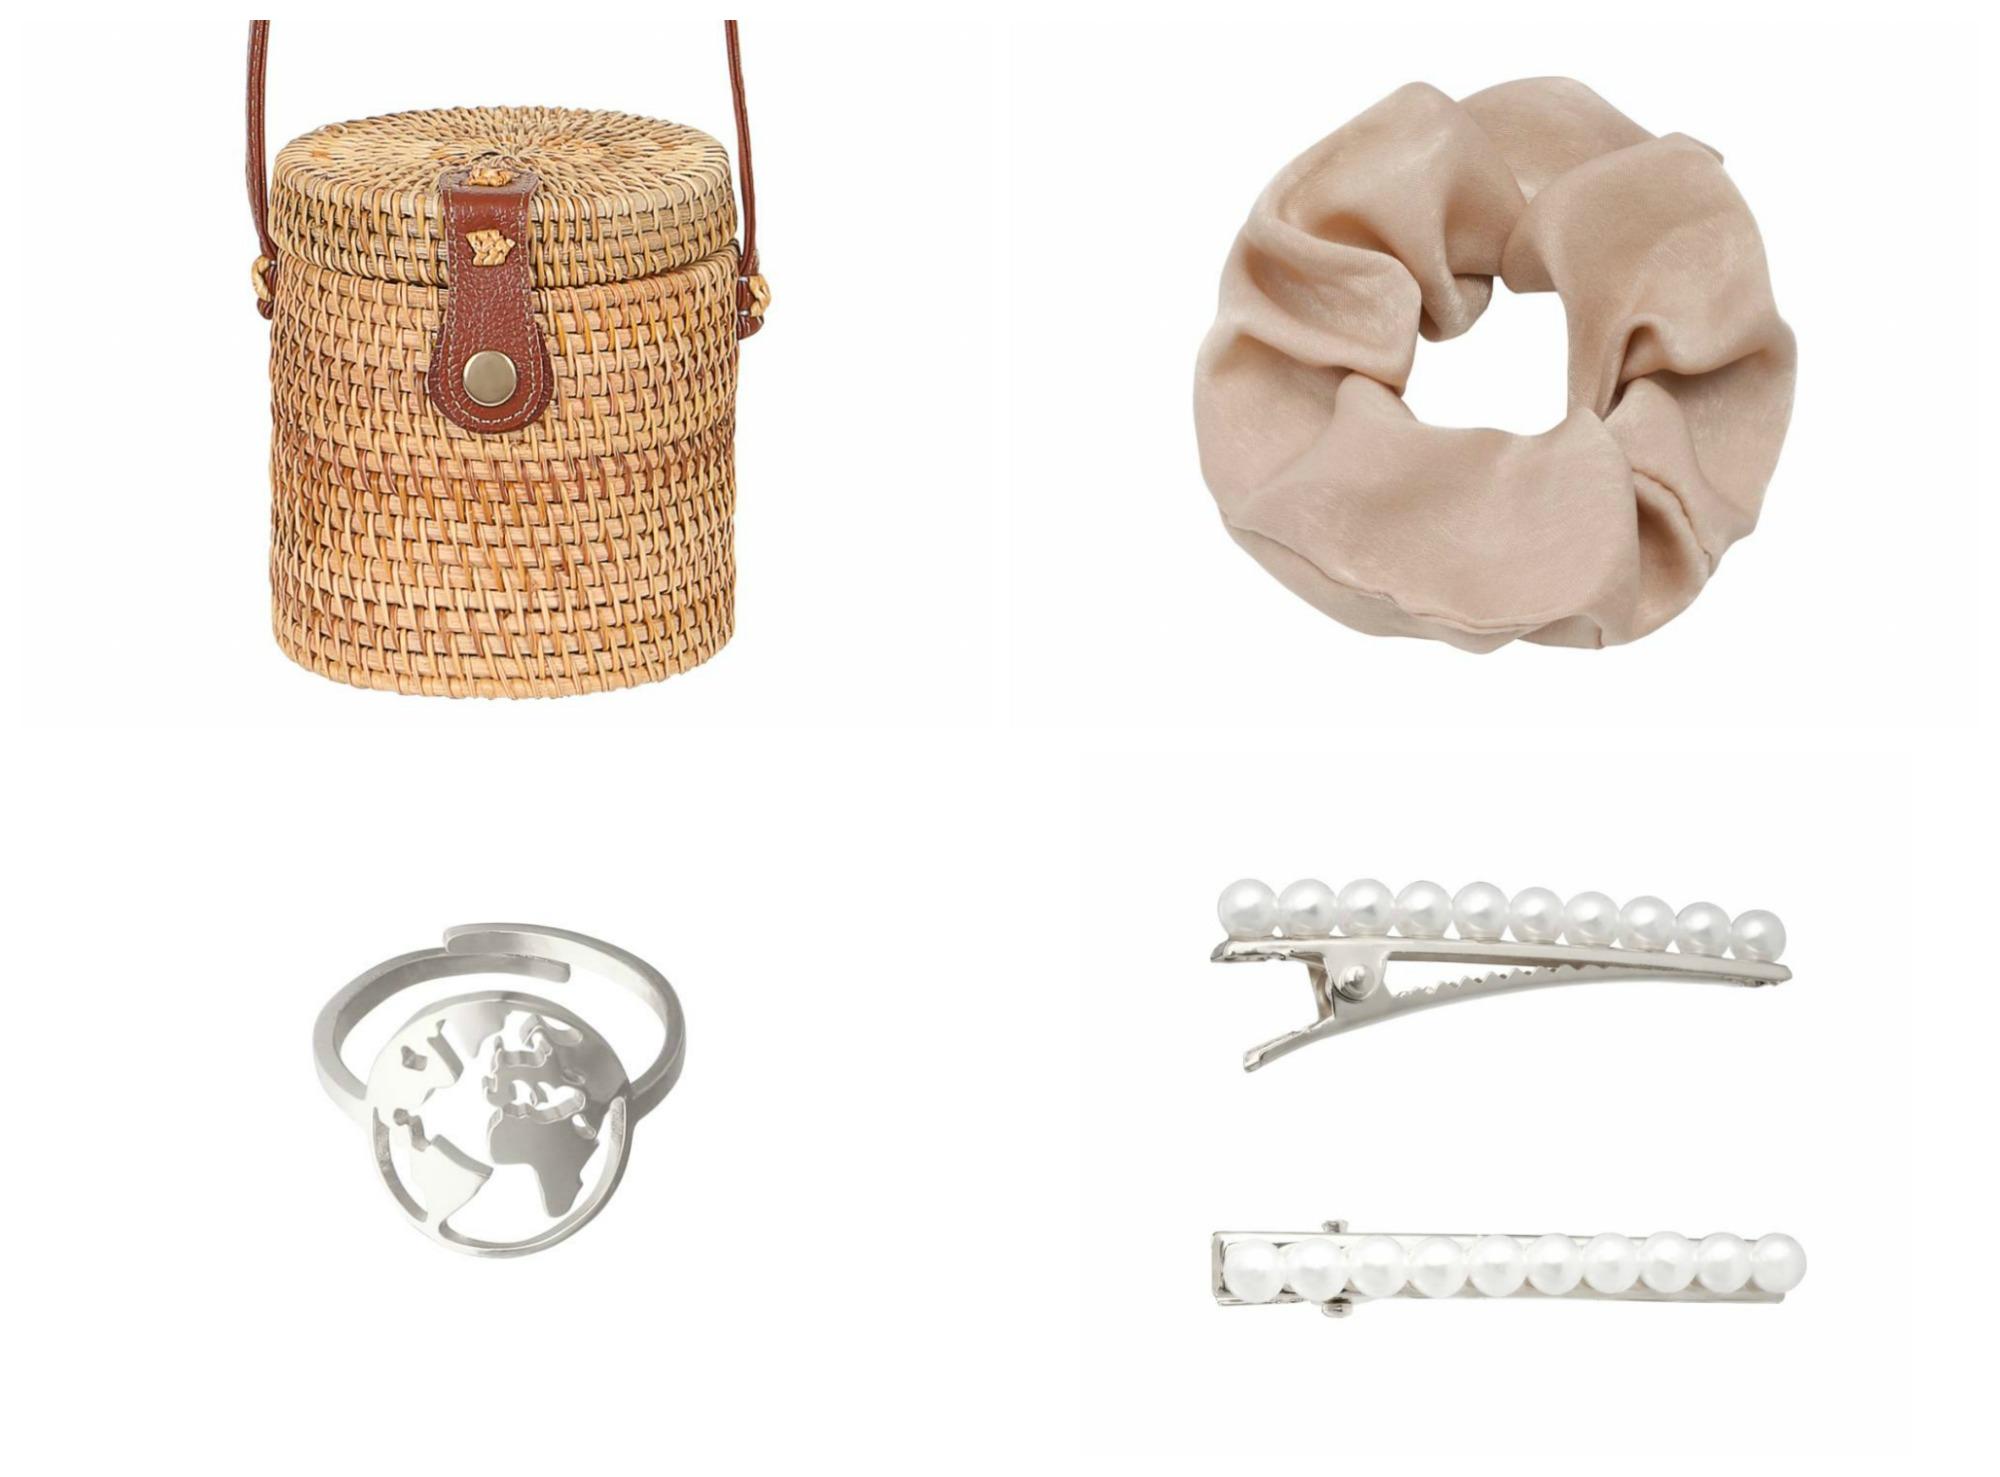 lente spring fashion trends sieraden 2019 hot items